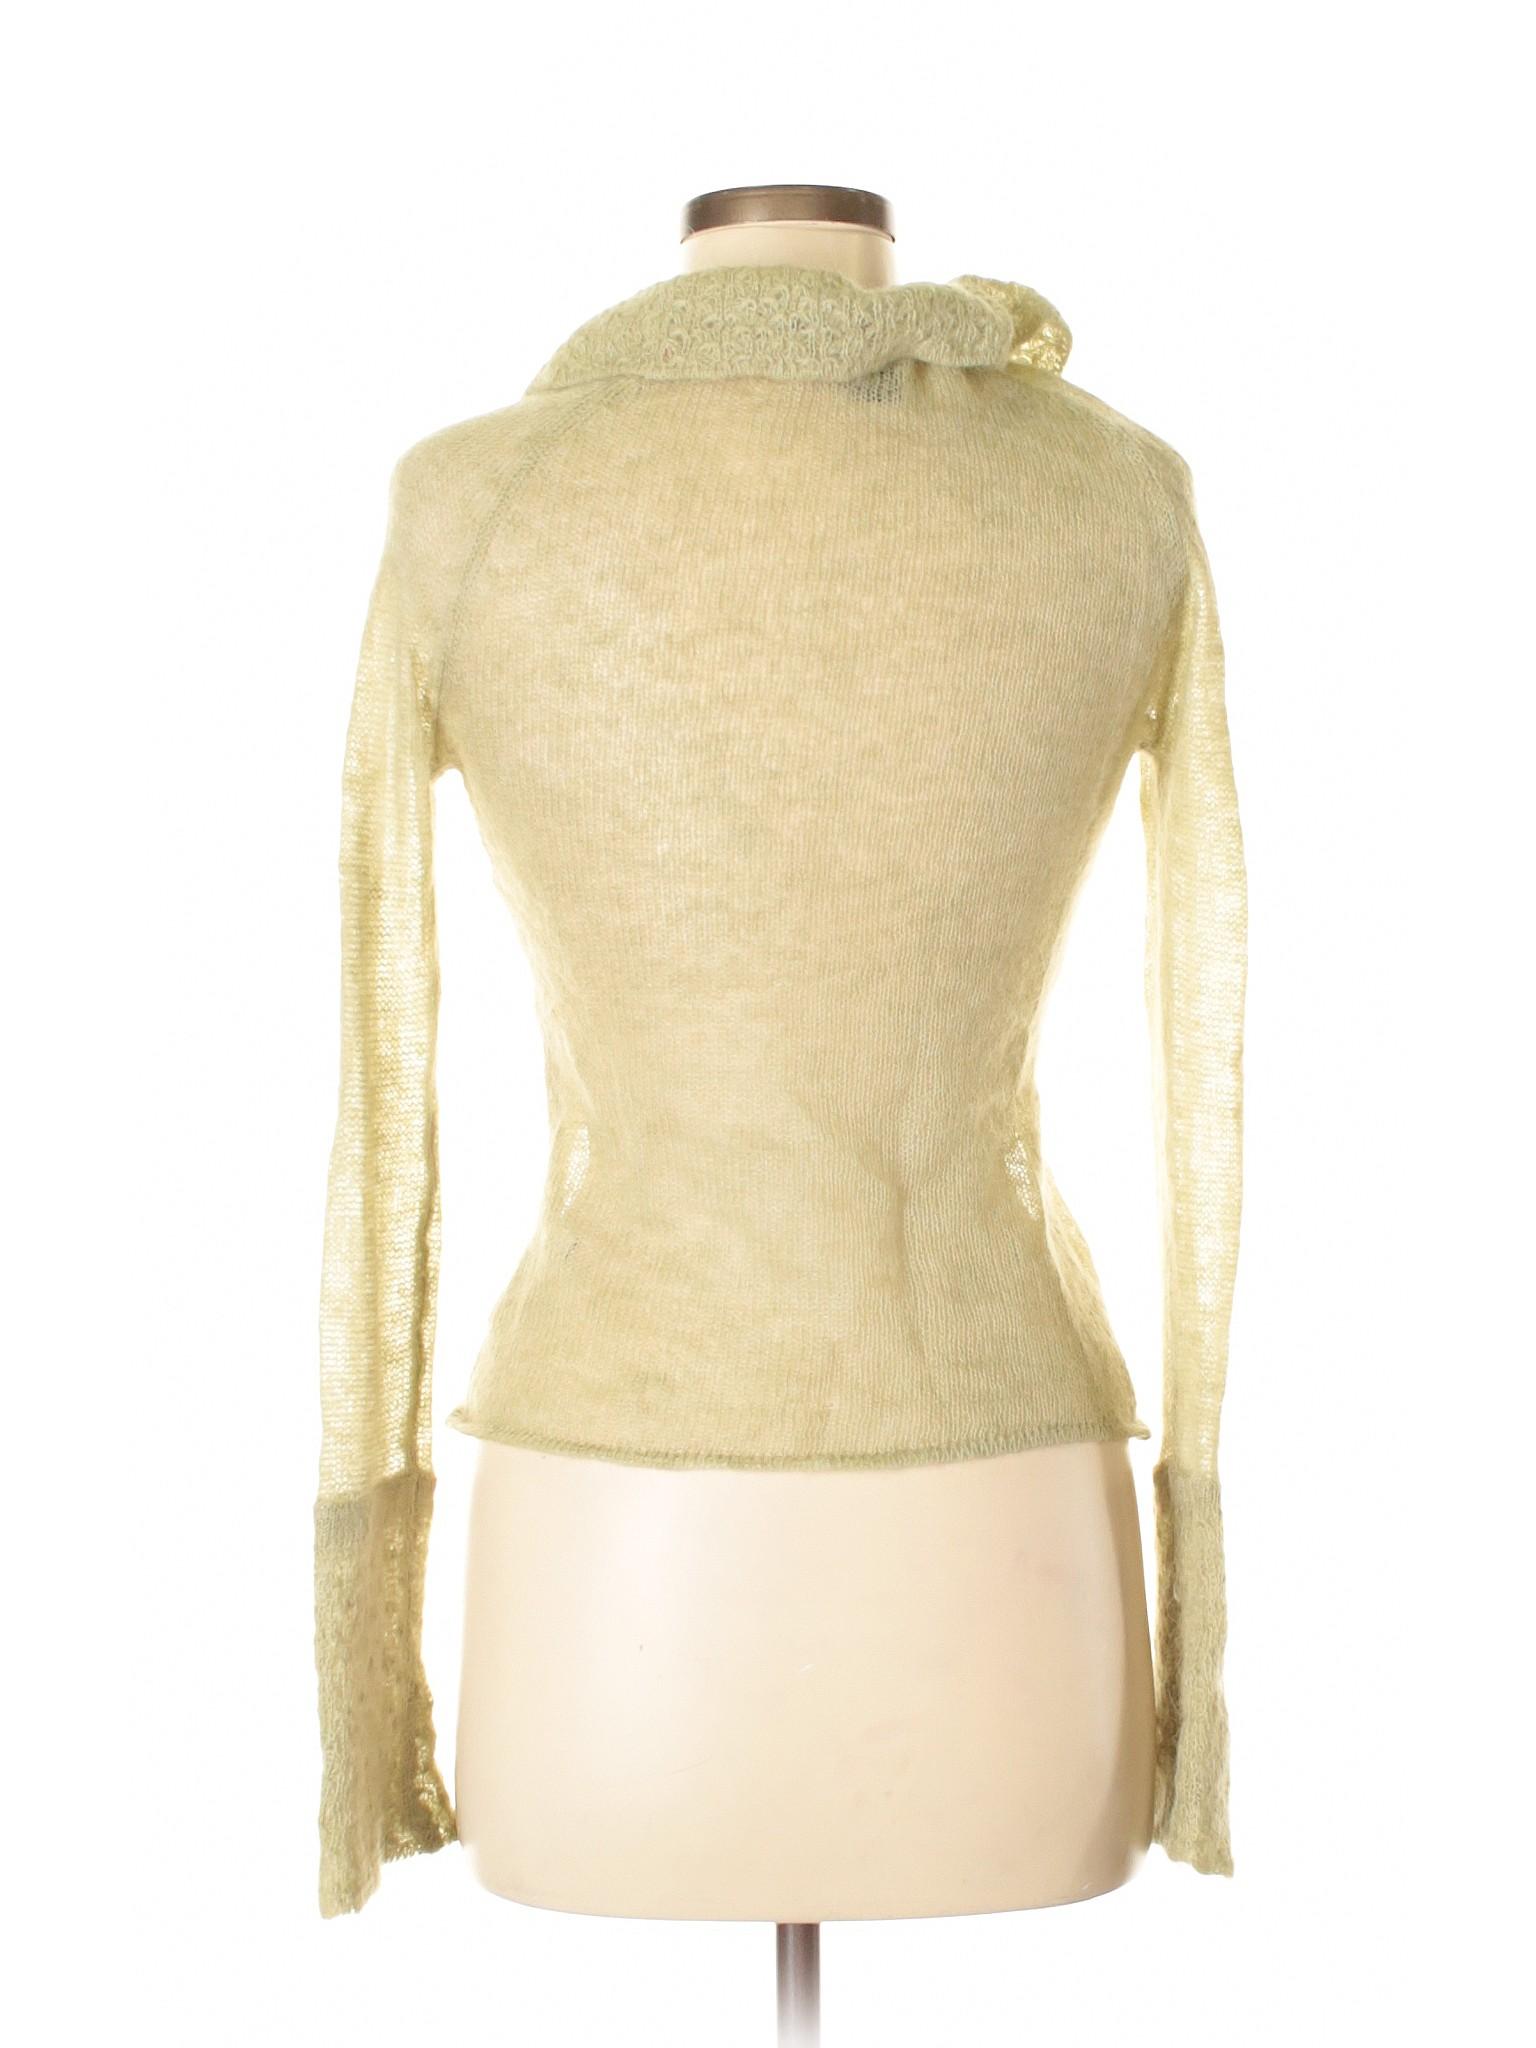 Boutique Pullover Kenzie Boutique Kenzie Sweater 4Cq54pw